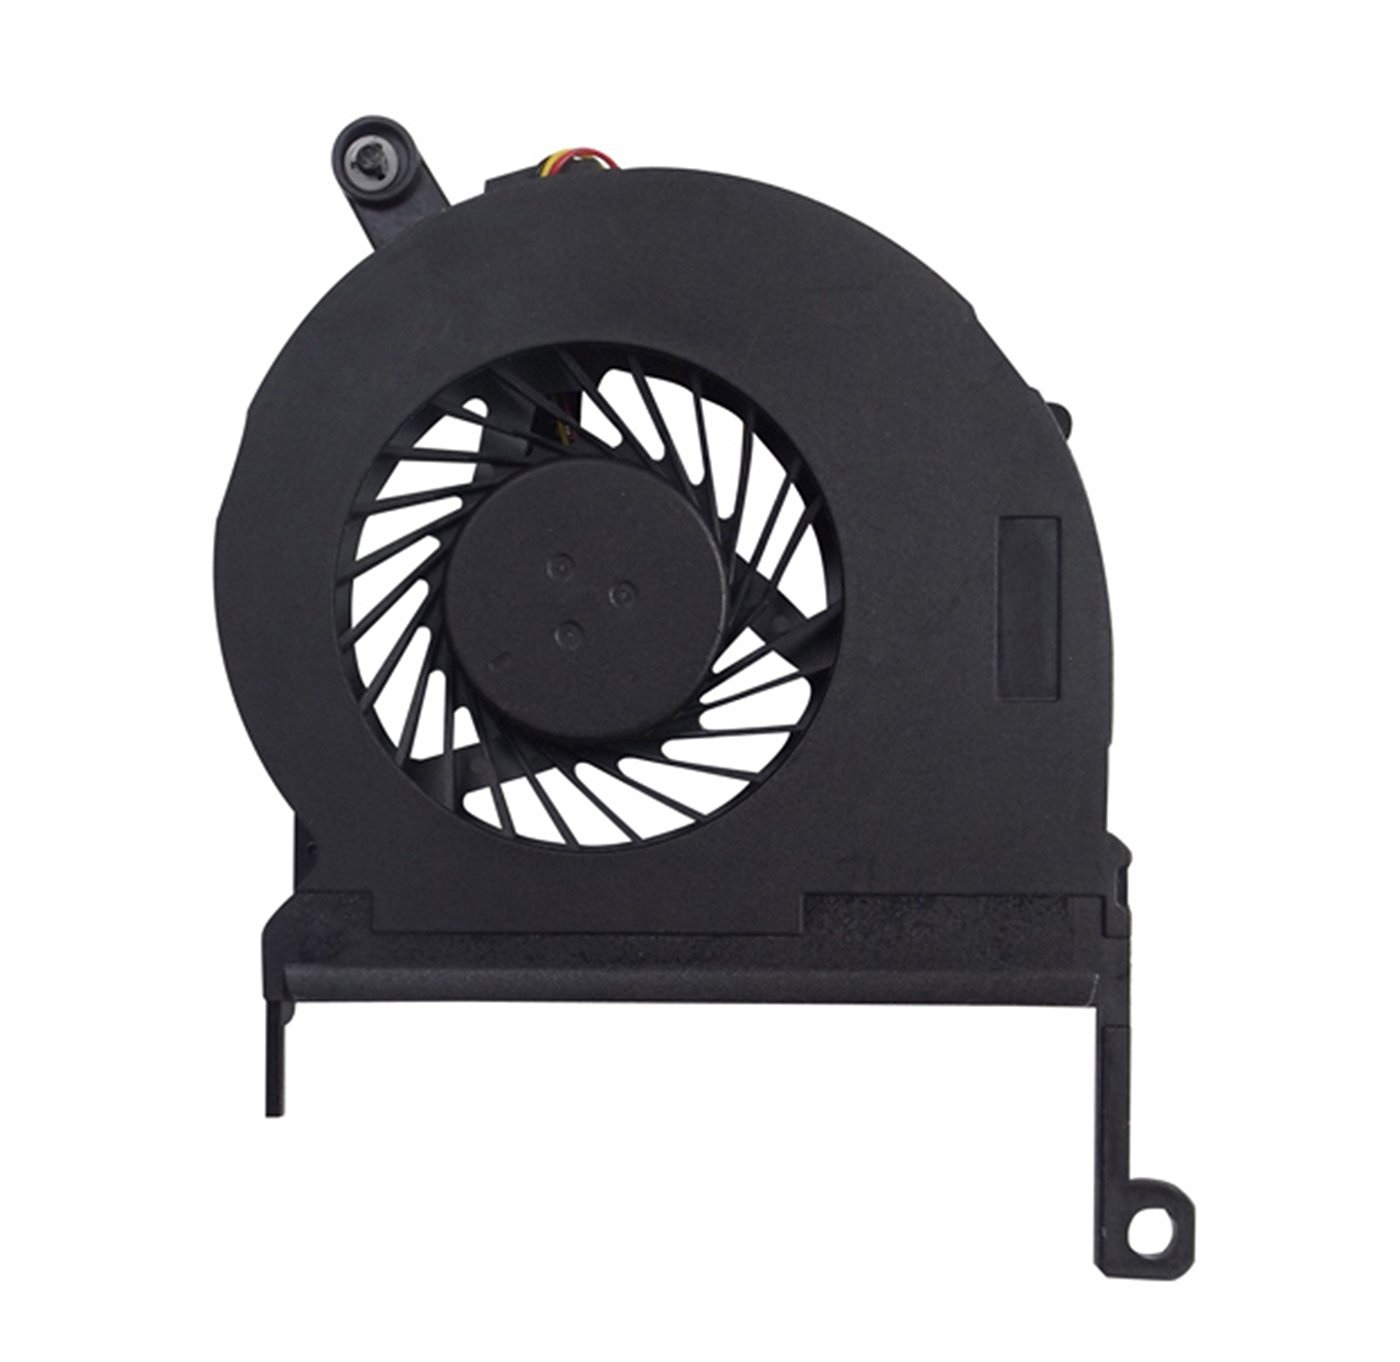 FEBNISCTE Laptop CPU Fan for Acer aspire E1 E1-431 E1-451 E1-471G V3-471G